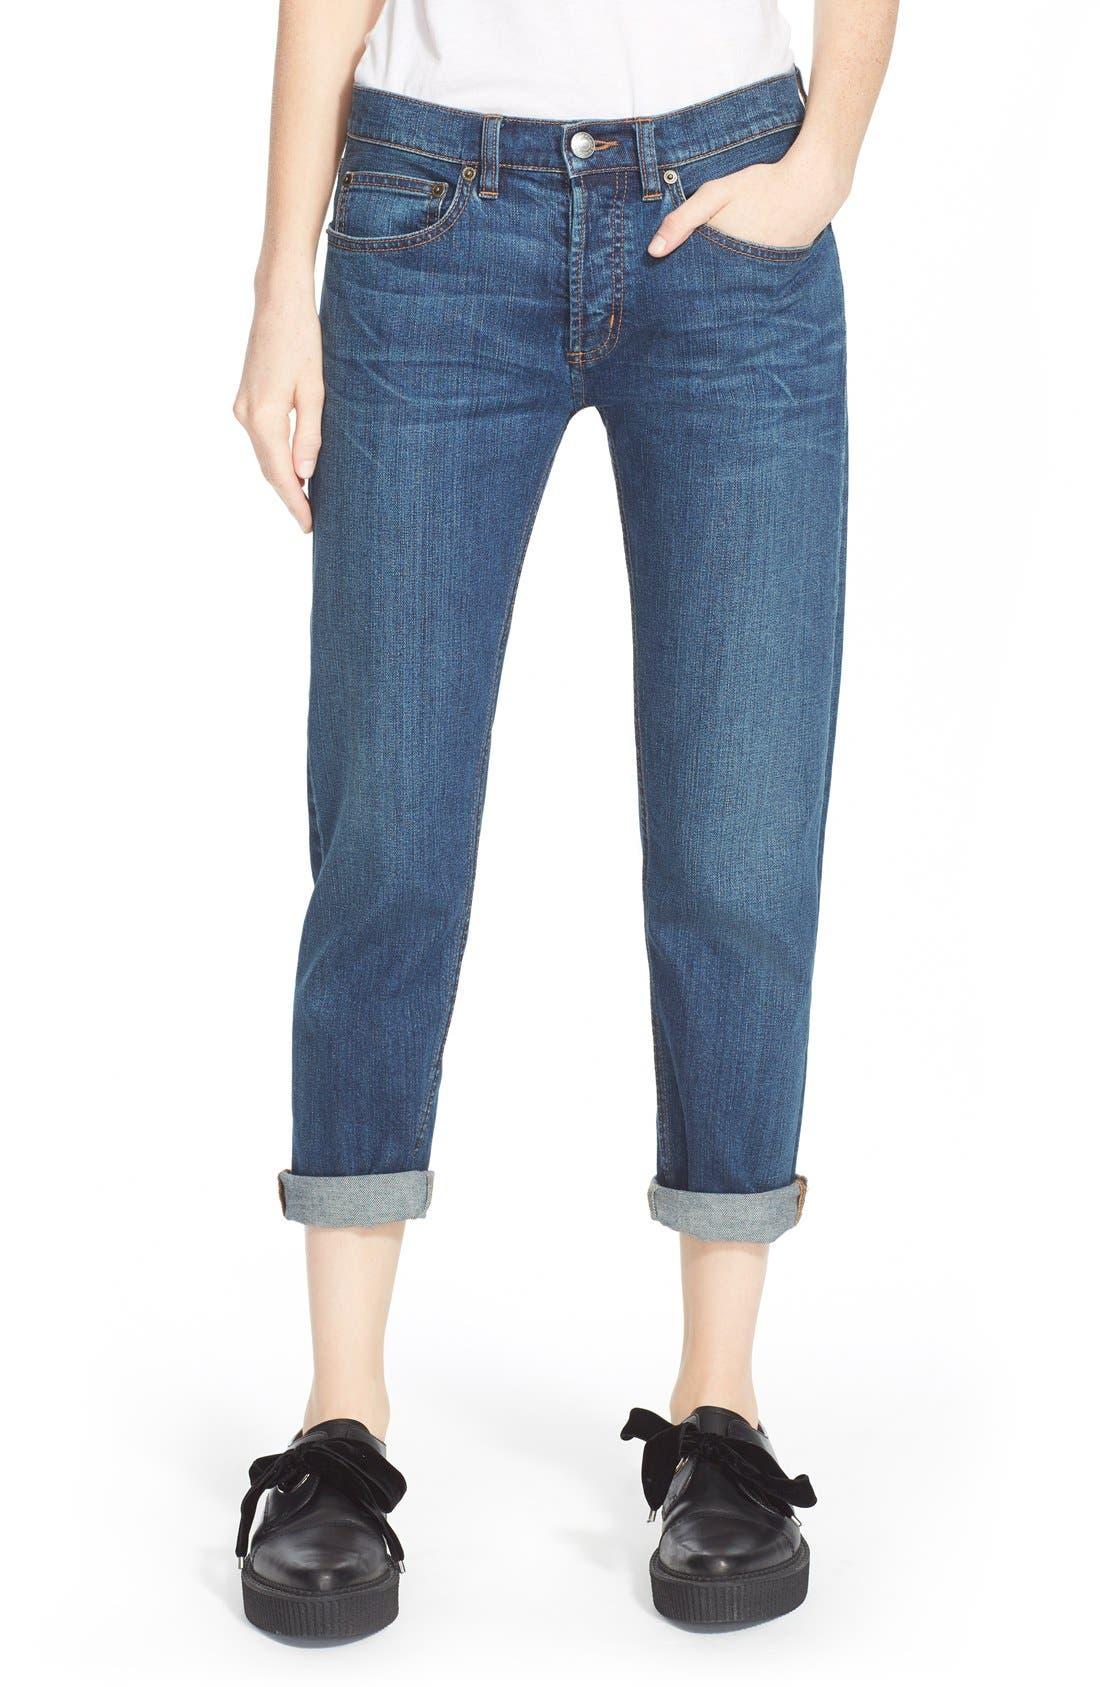 Alternate Image 1 Selected - MARC BY MARC JACOBS Slim Crop Boyfriend Jeans (Vintage Blue)